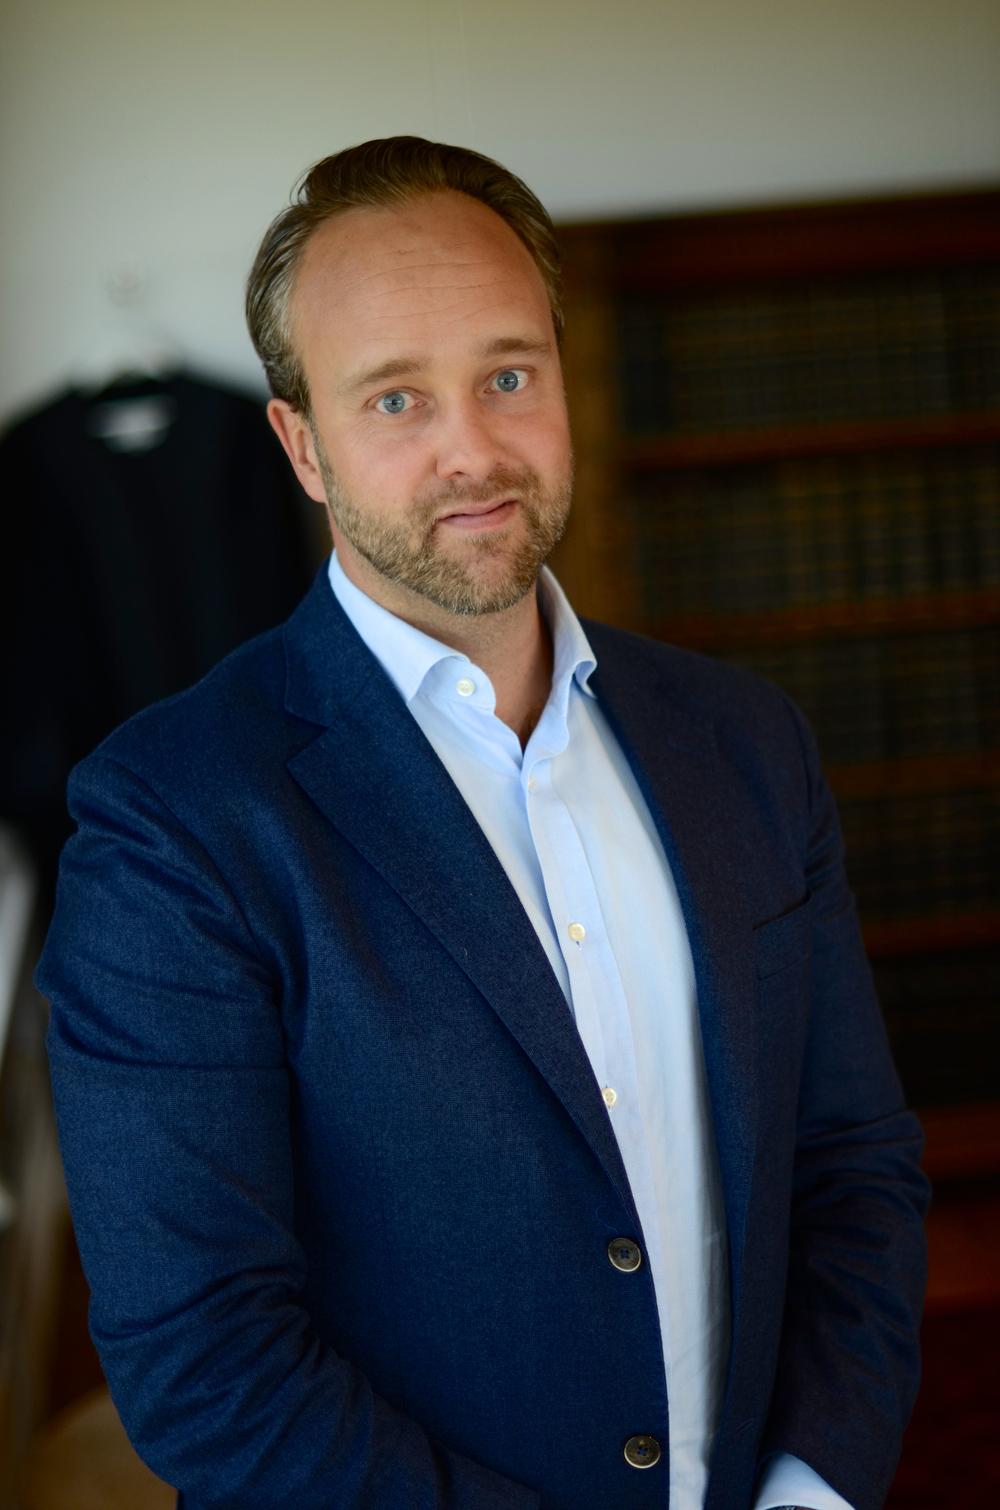 Lars Reinsnos